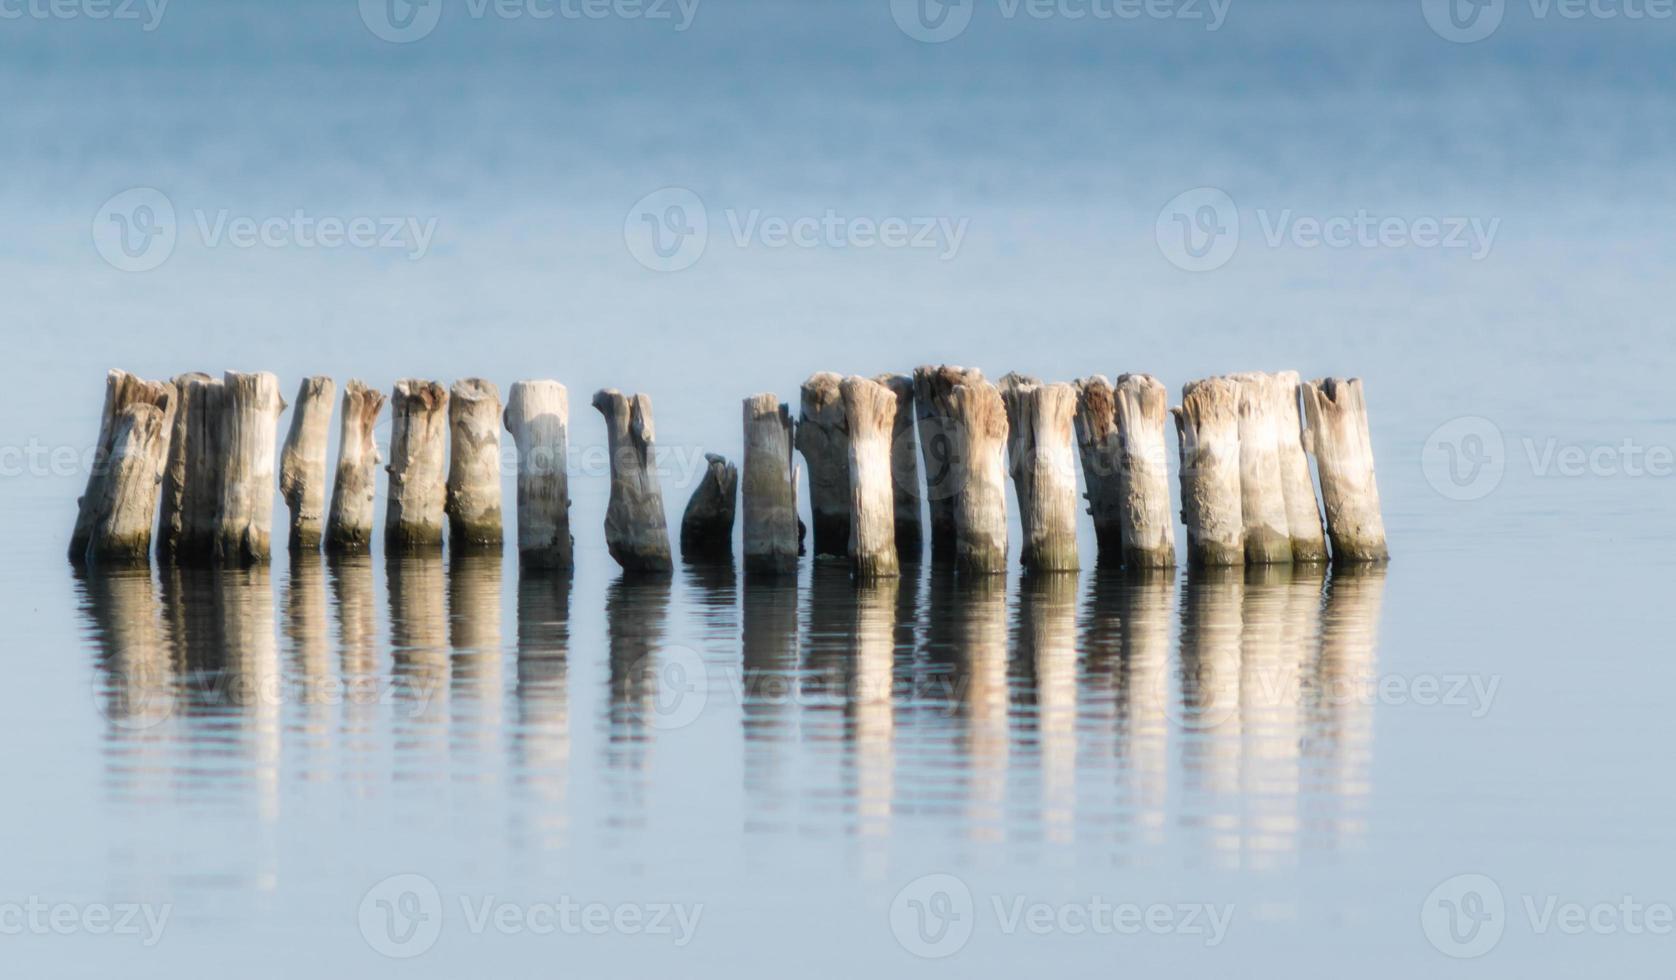 houten palen op een rij in water foto